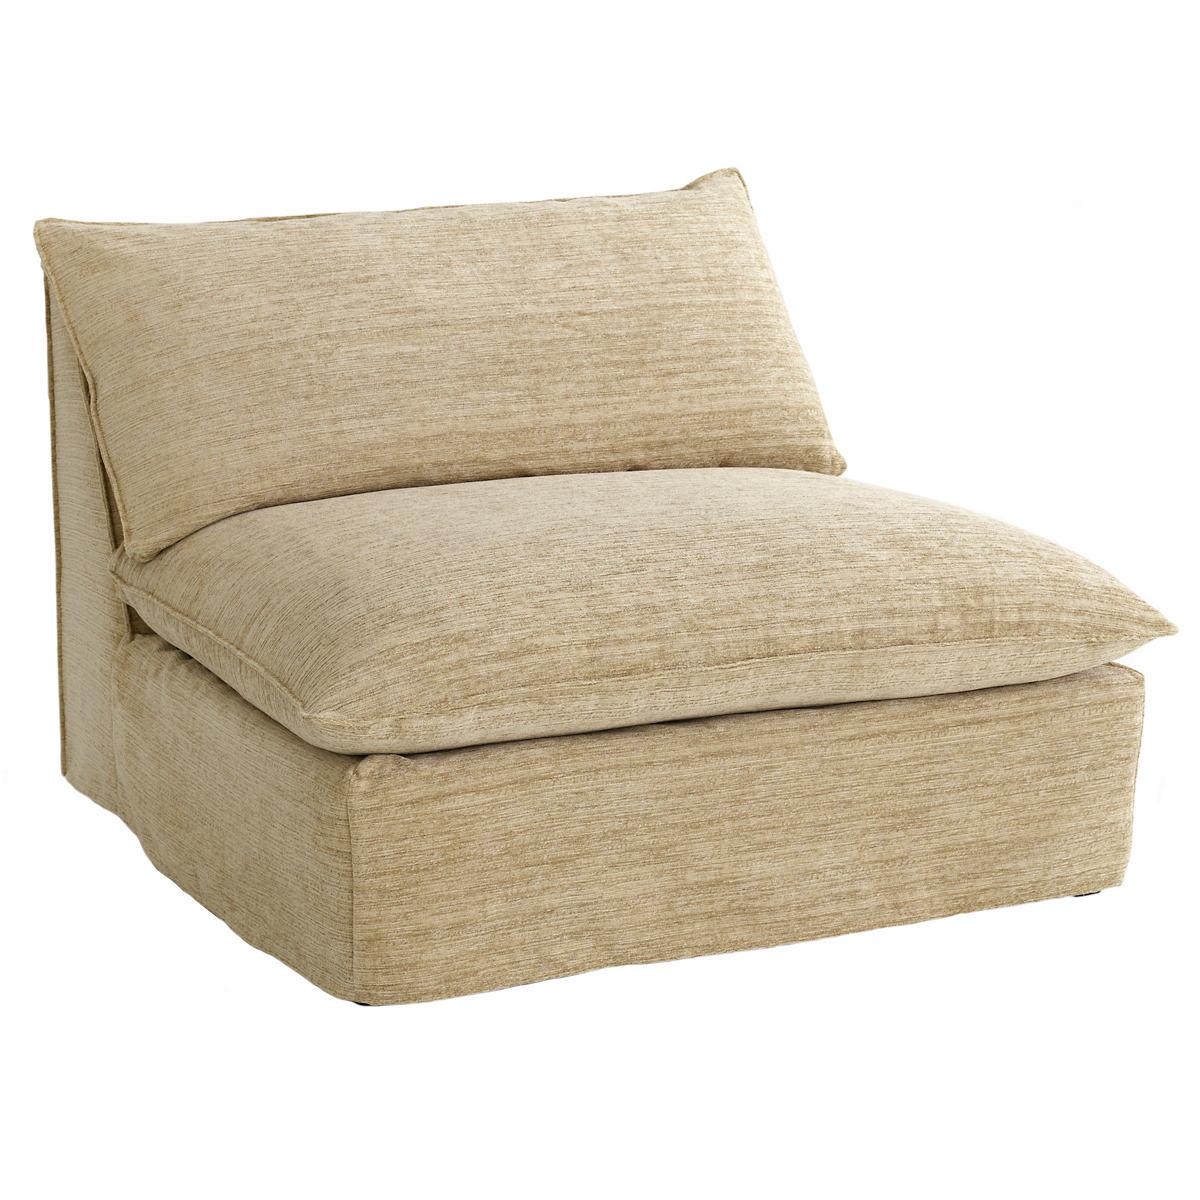 Bark Wheat Hollingsworth Chair